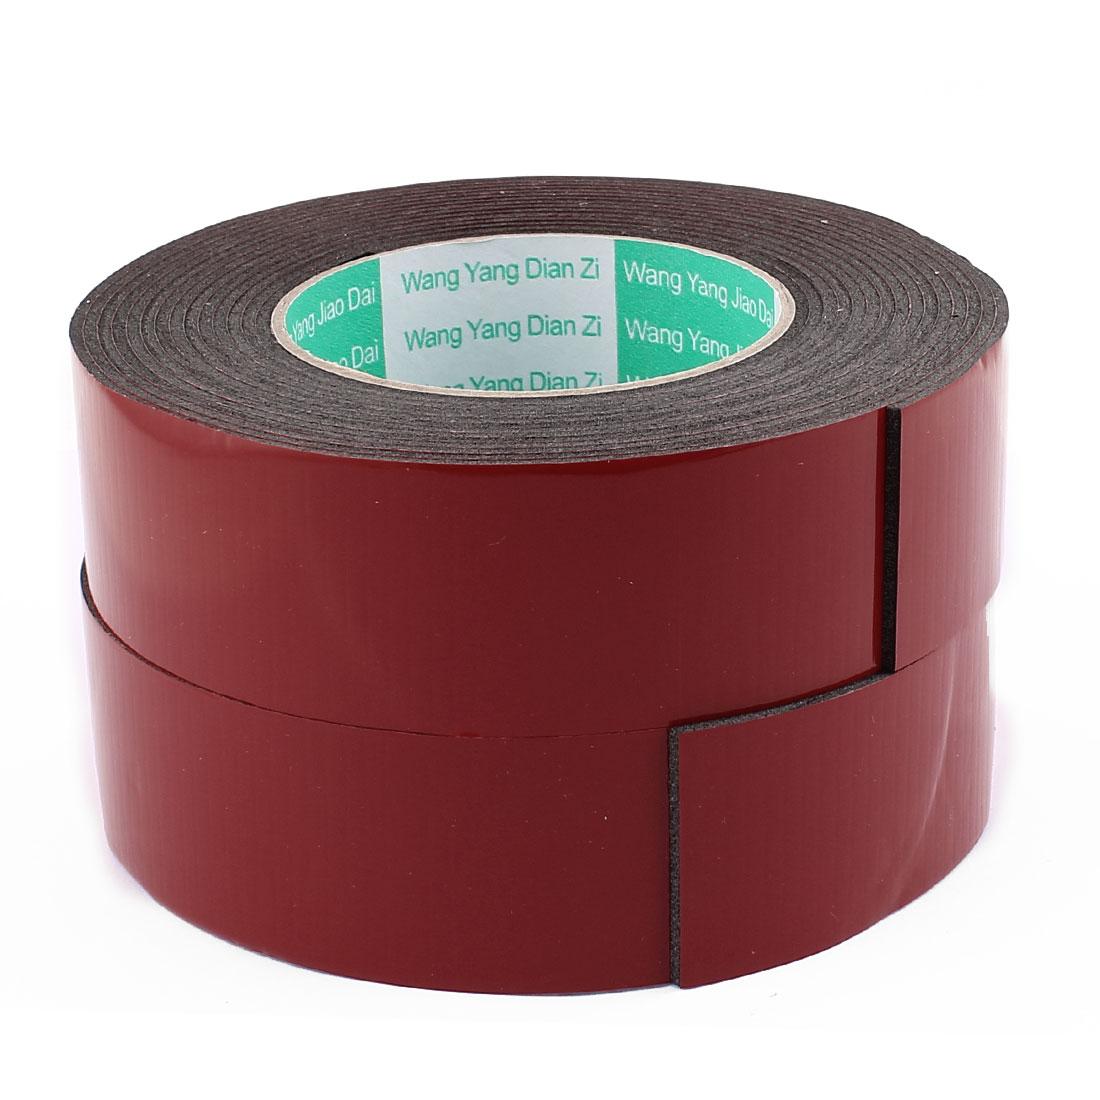 Unique Bargains 2 Pcs Black Strong Double Sided Adhesive Tape Sponge Tape 40MM Width 5M Long